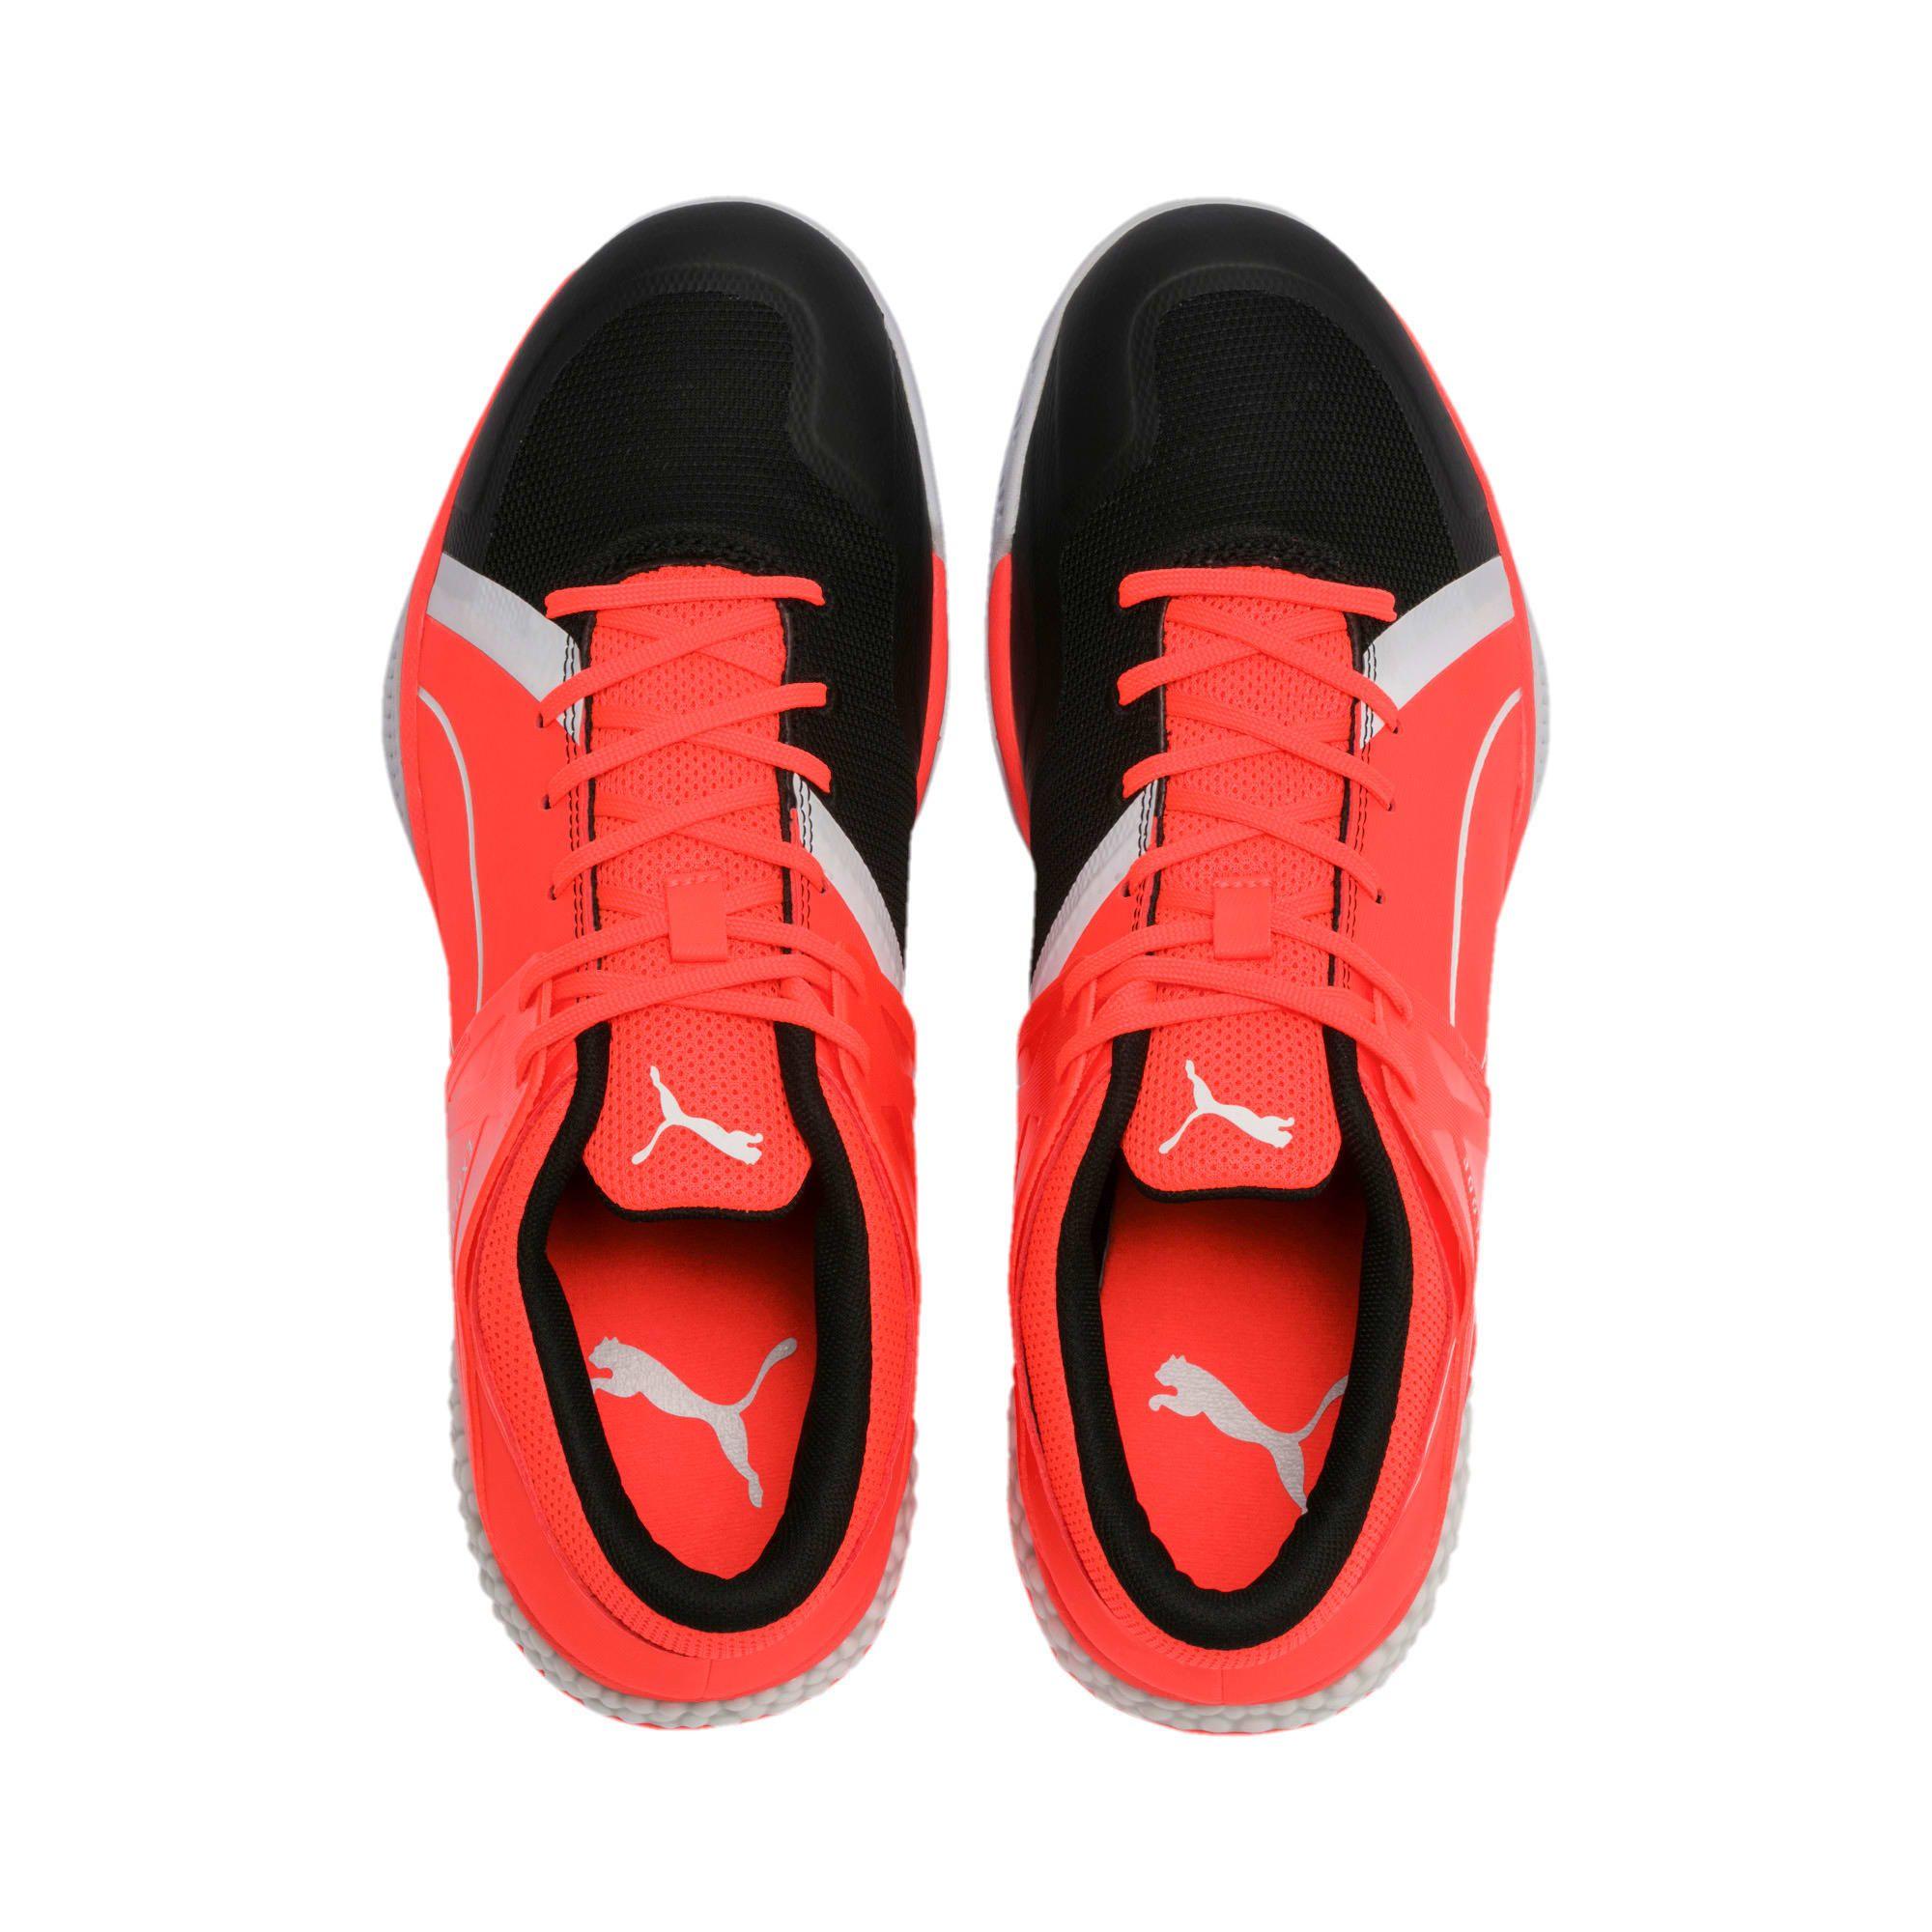 PUMA Chaussures Handball Explode XT Hybrid 2 Training, Noir